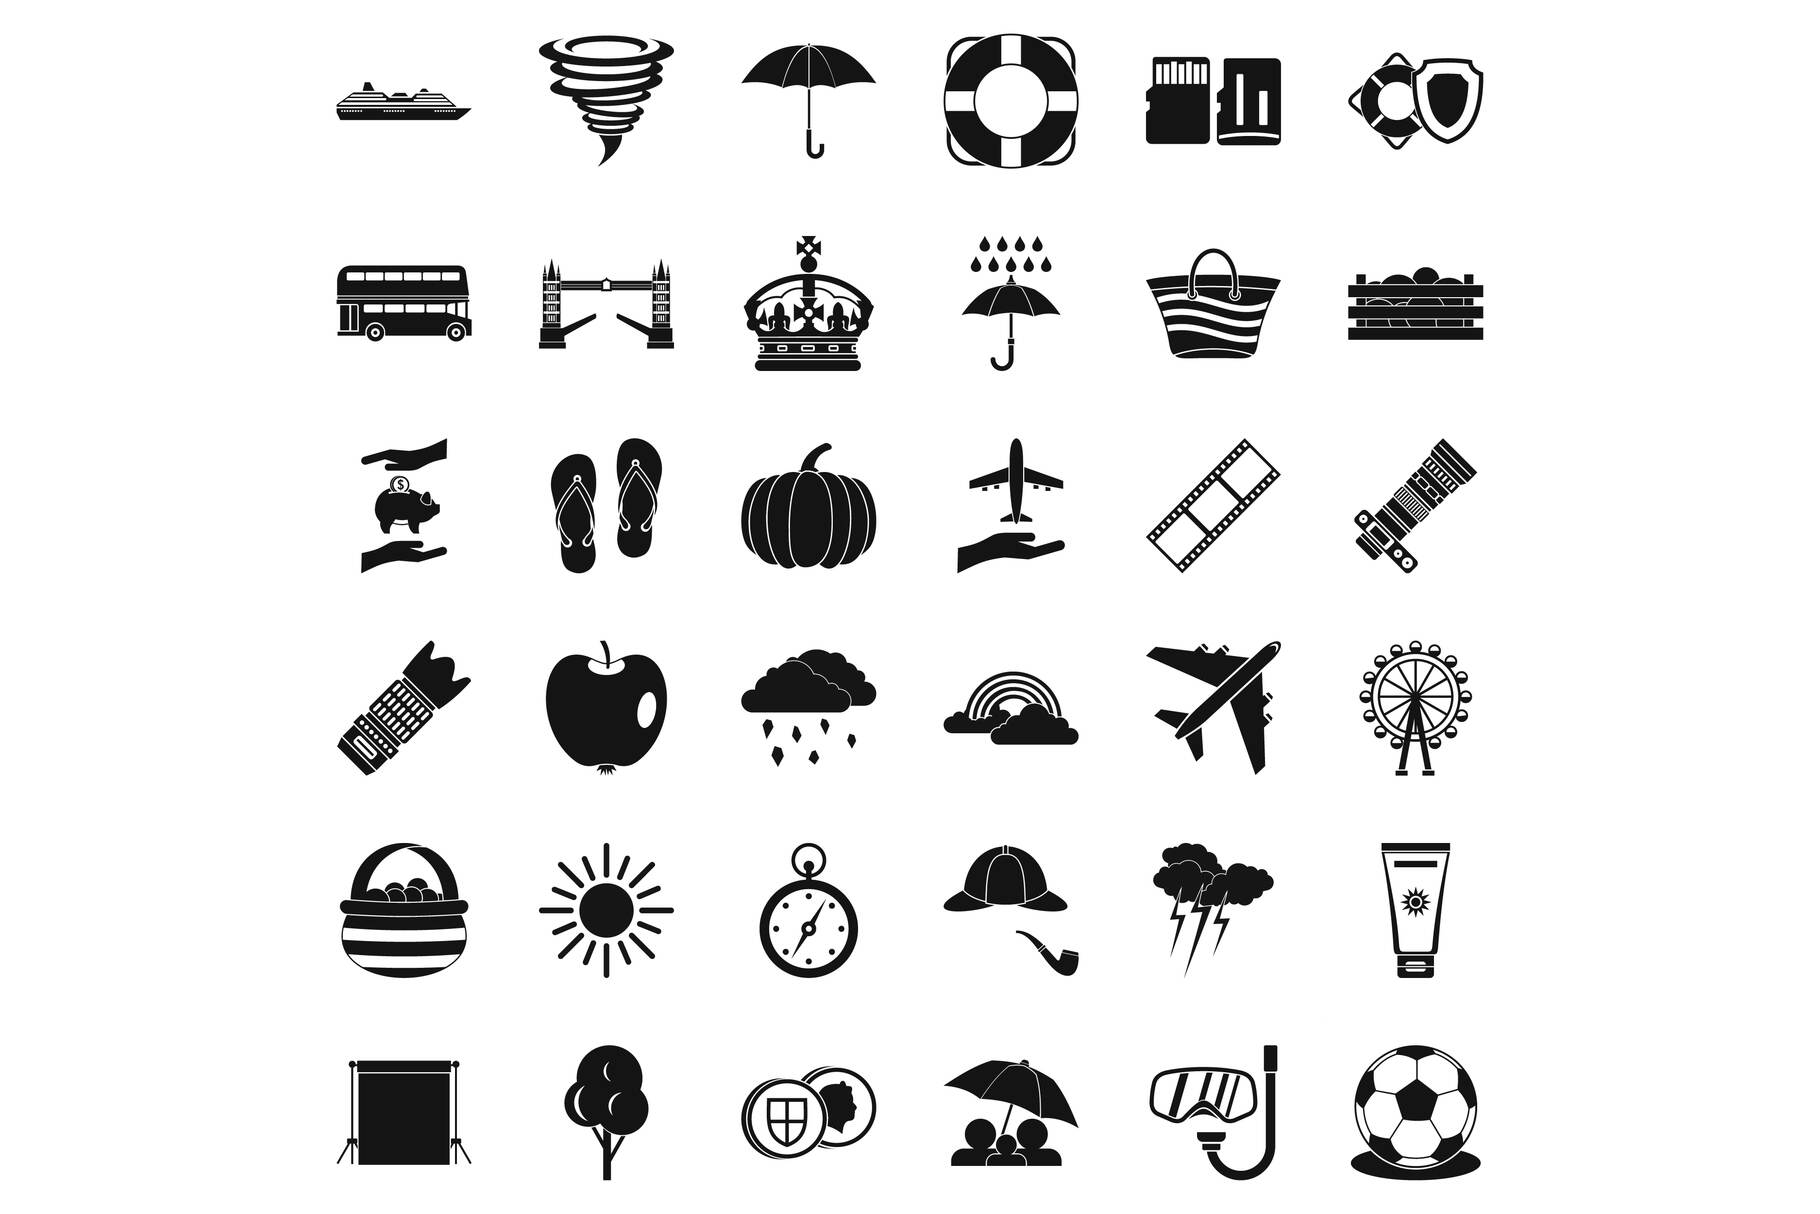 Umbrella icons set, simple style example image 1